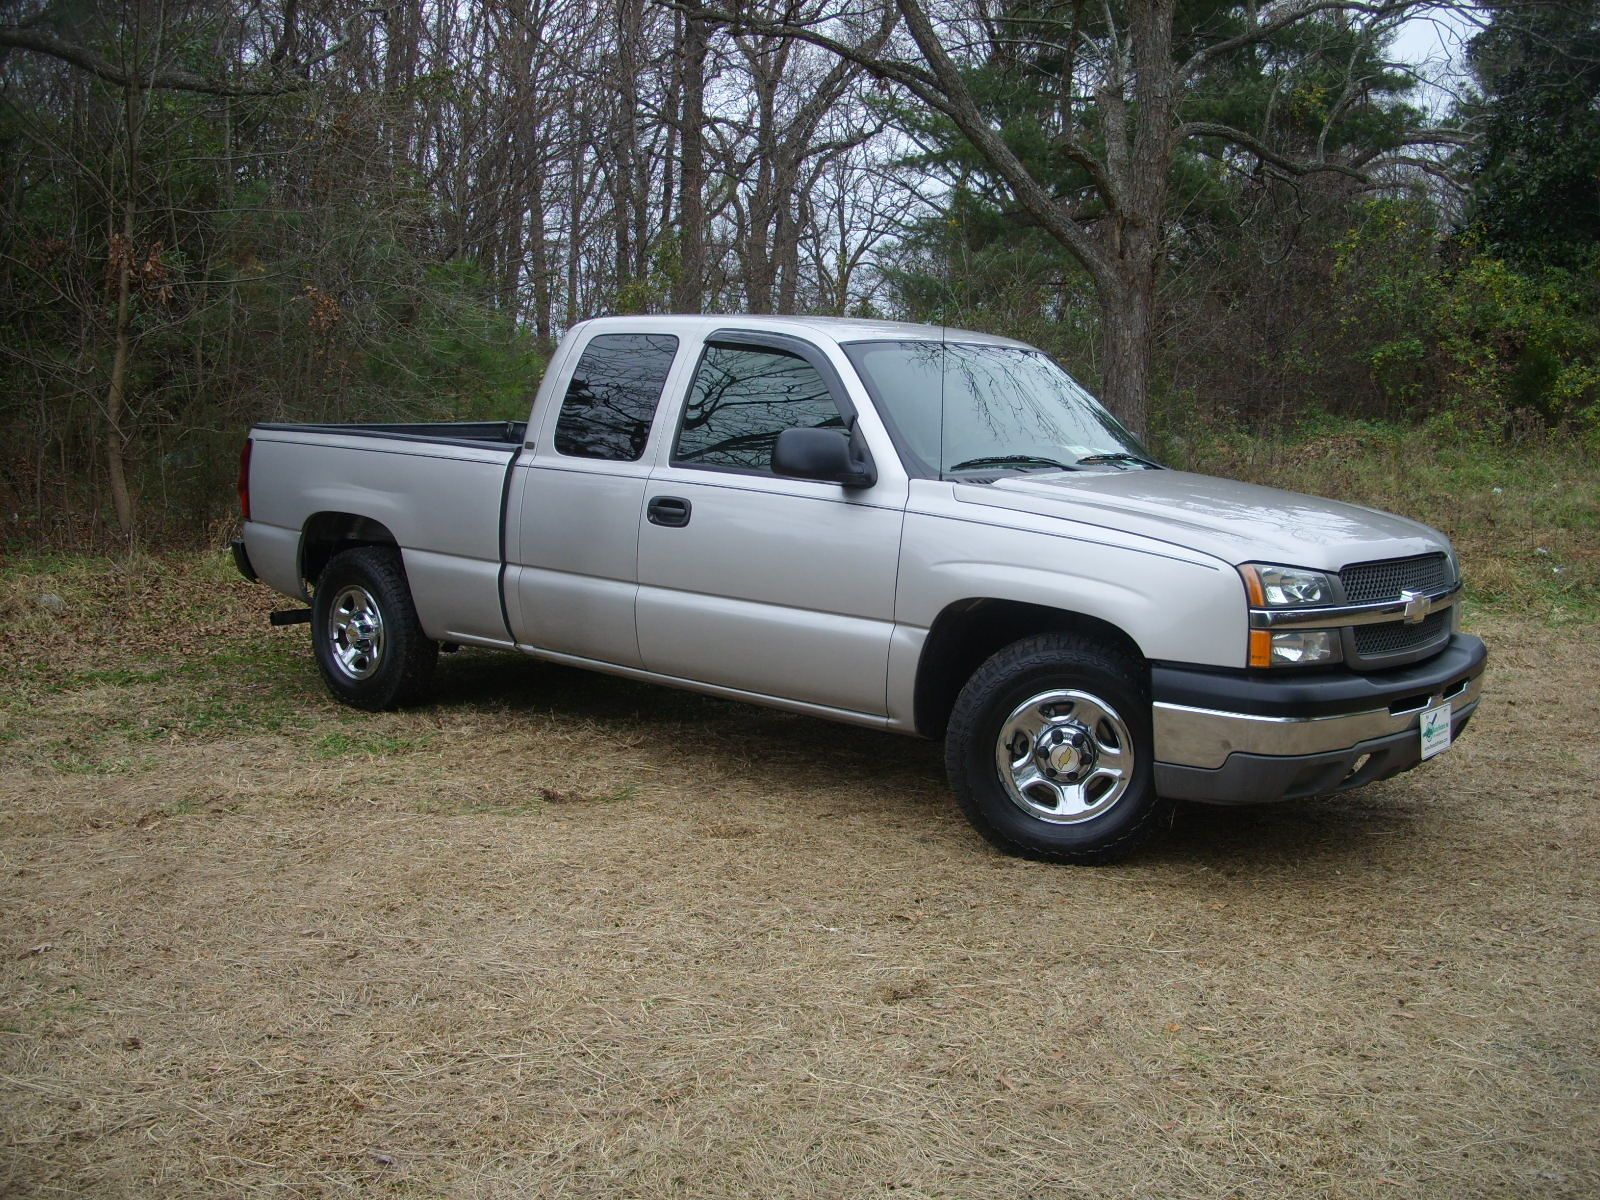 Used 2004 Chevrolet Silverado 1500 For Sale Durham NC